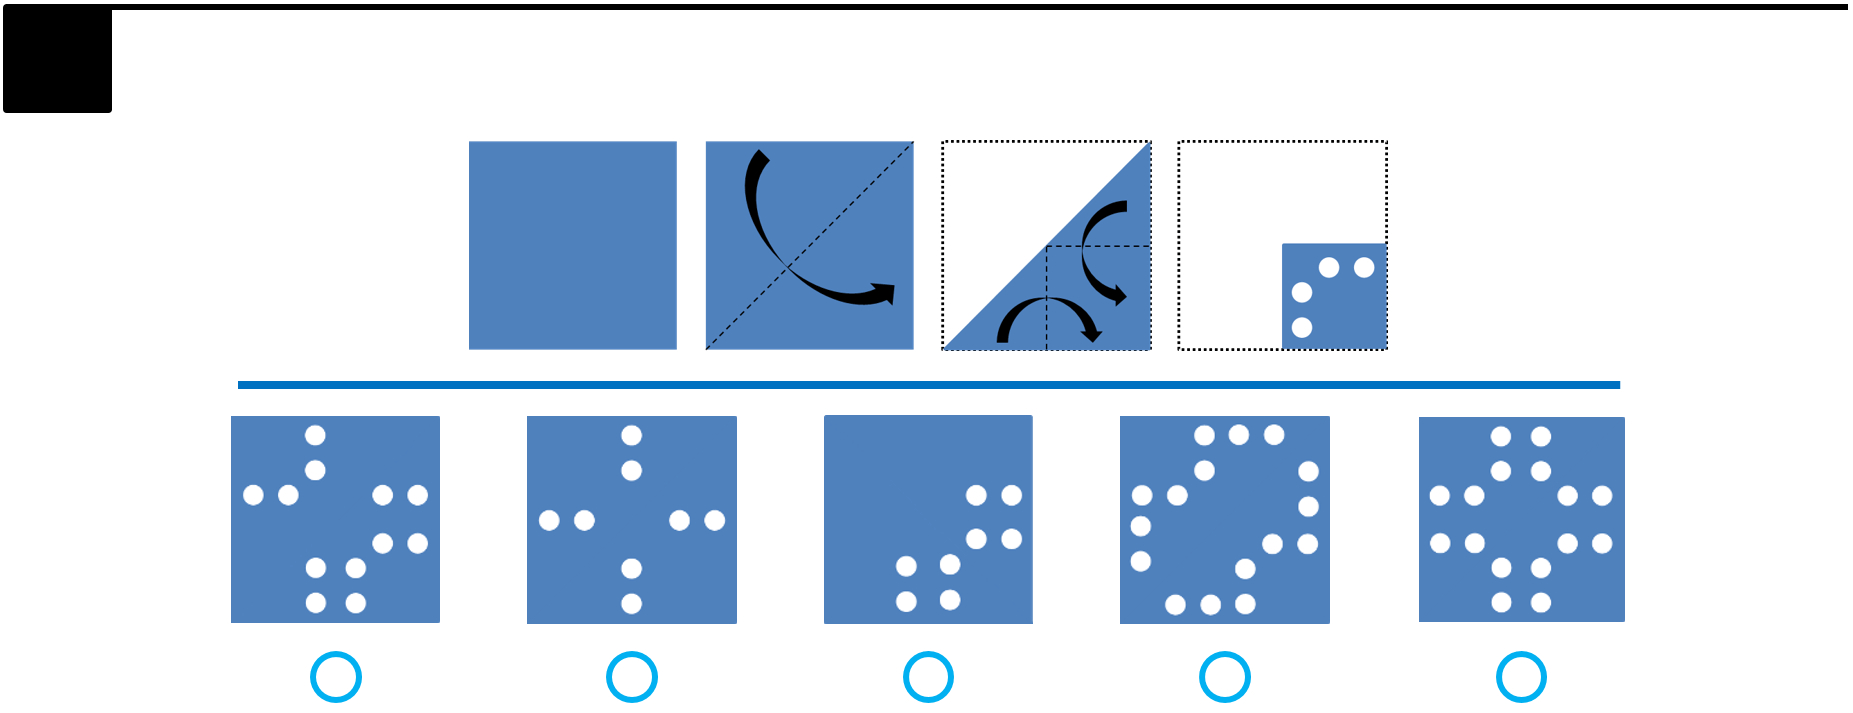 Free Cogat Sample Test - 6Th Grade - Testprep-Online - Free Printable Hspt Practice Test